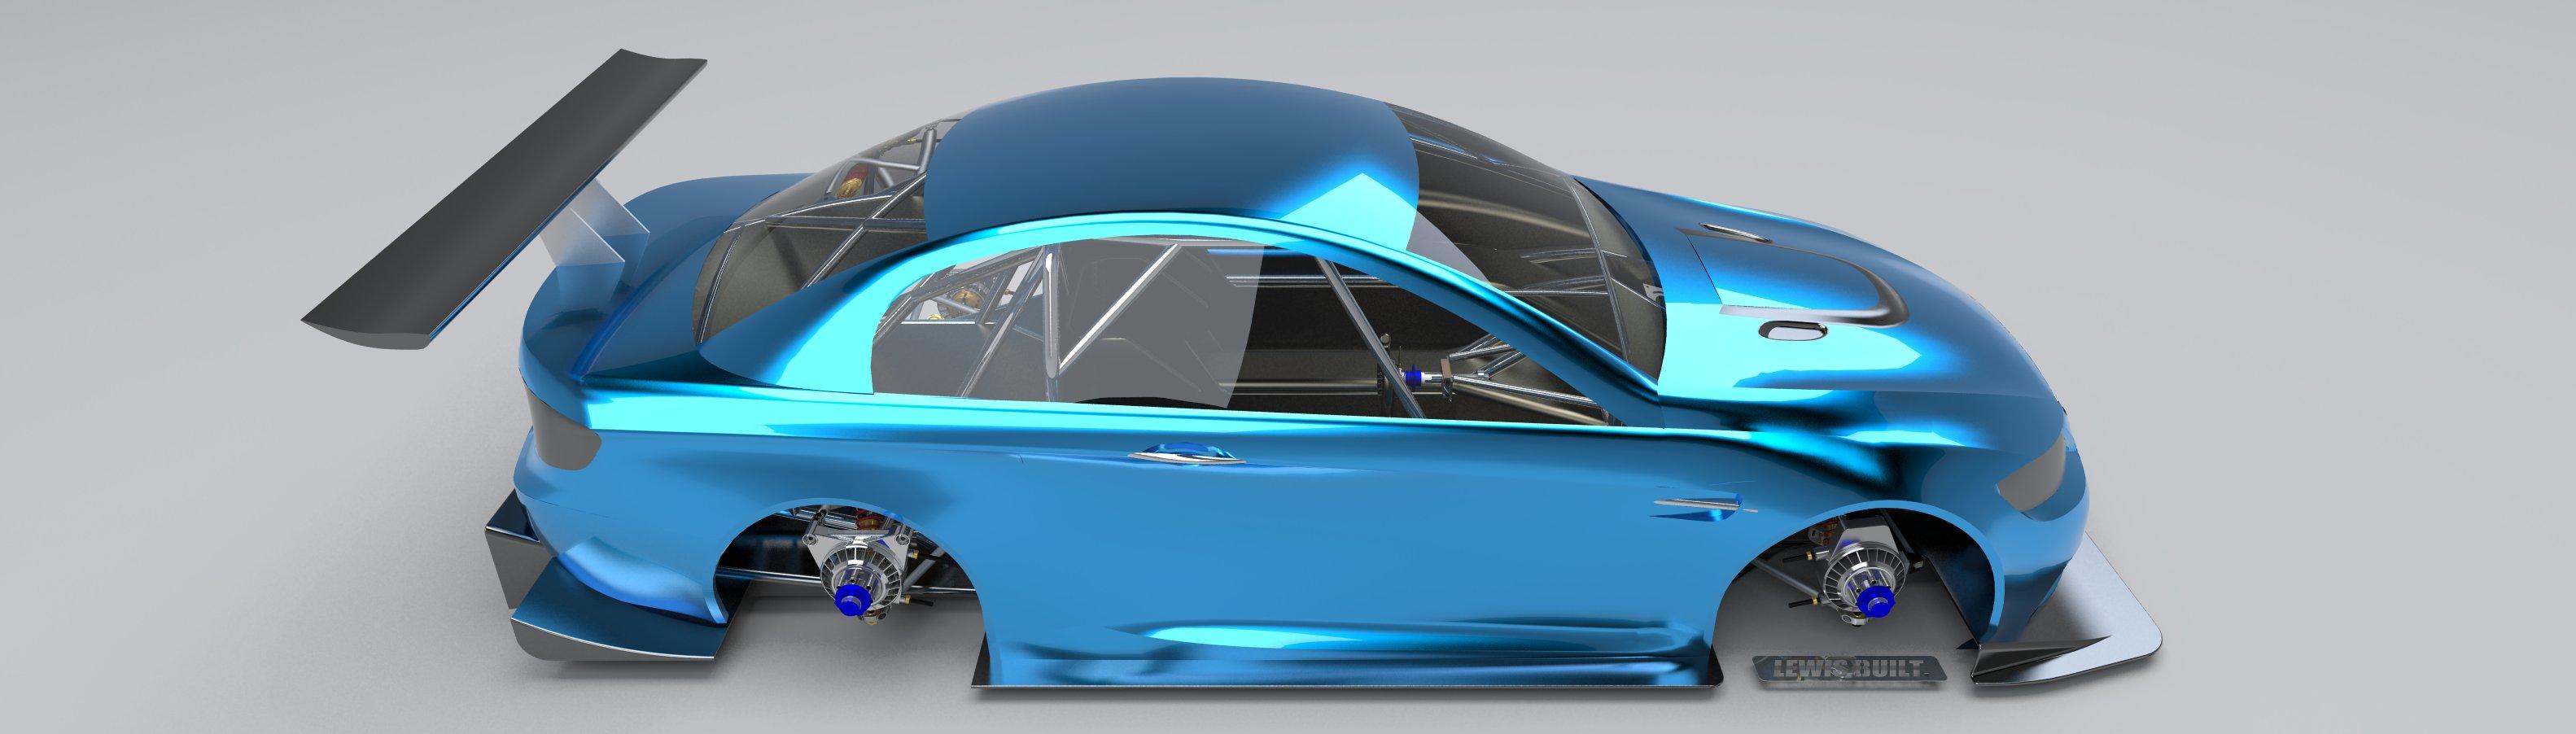 Exclusive Look Peasnell Racing Designs Build Threads